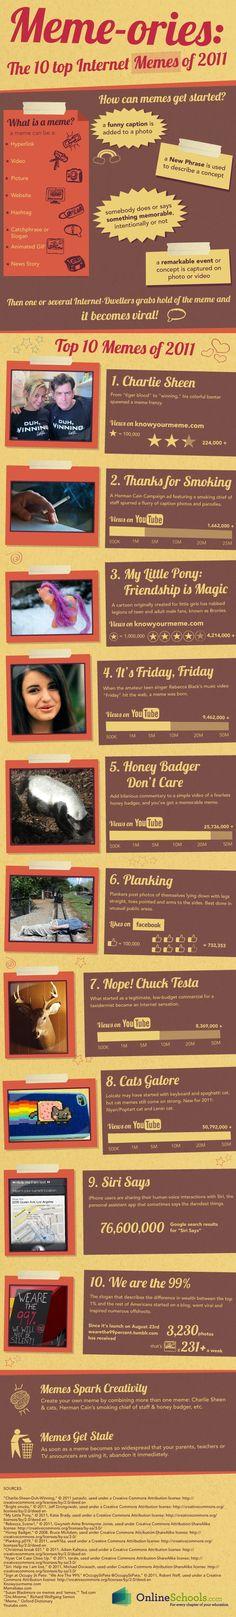 10 Top Internet Memes of 2011